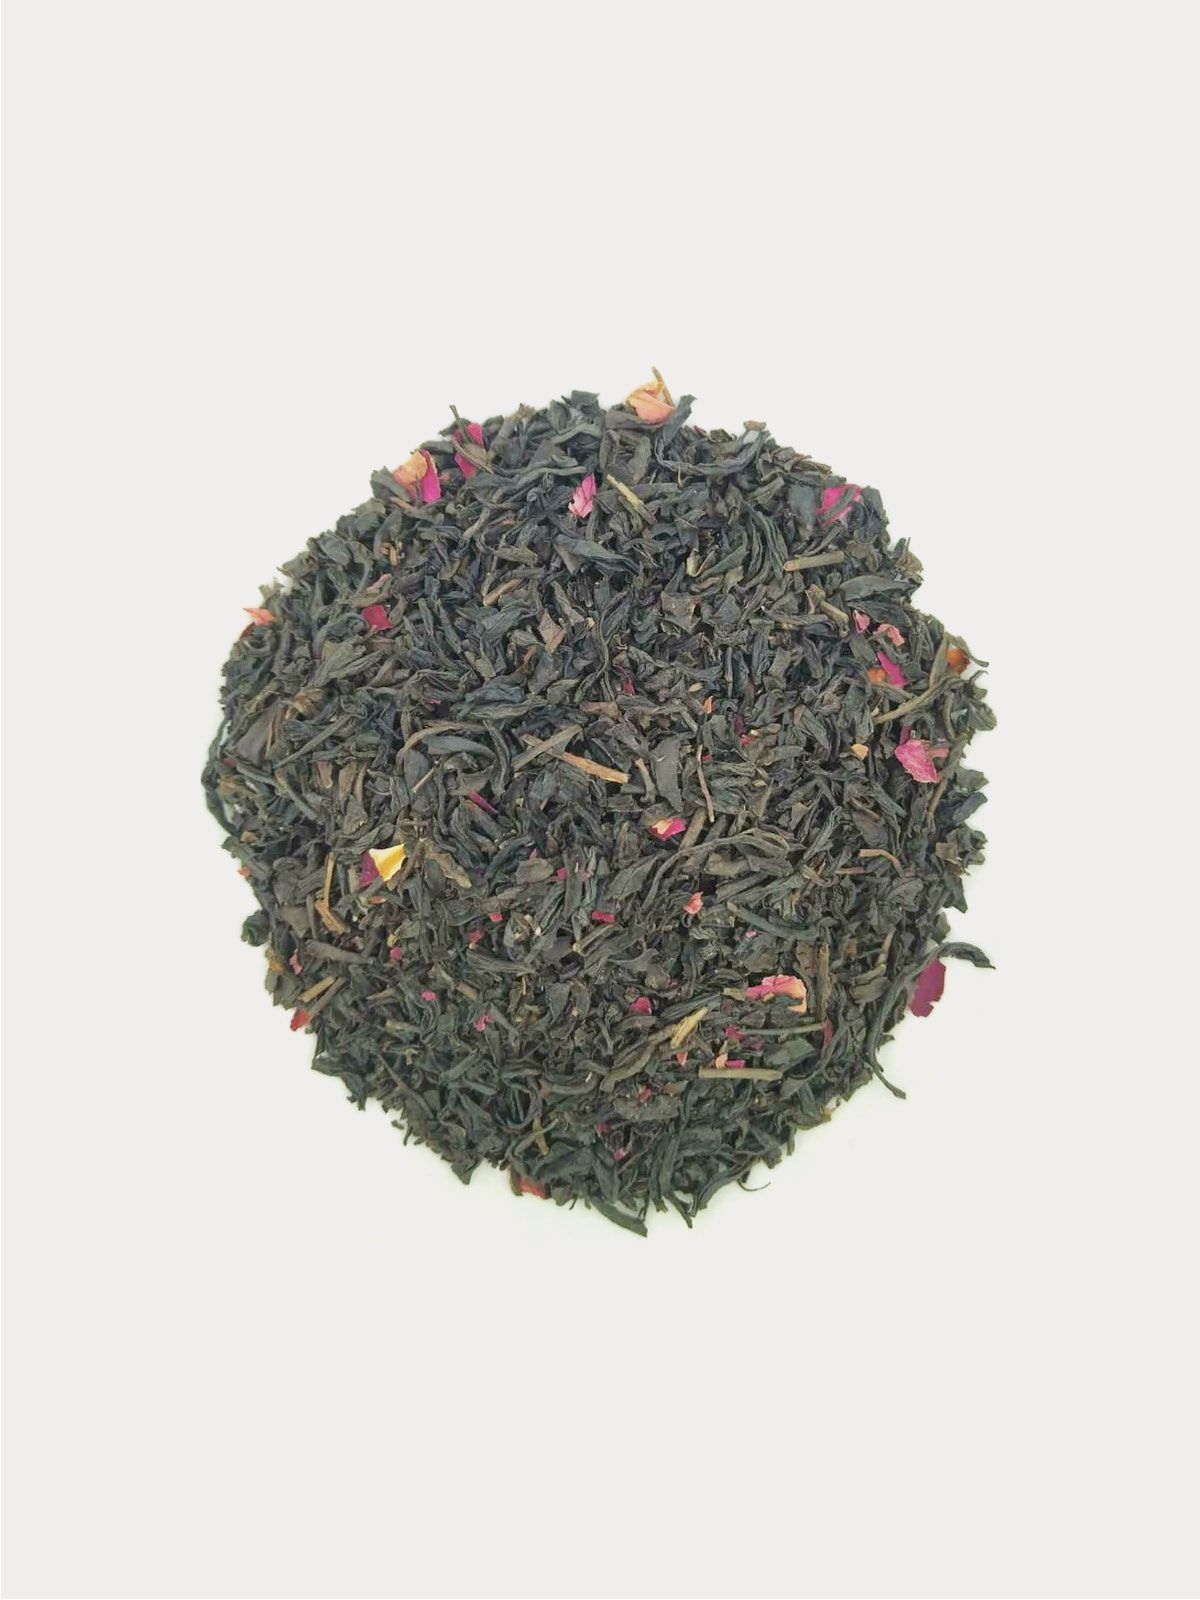 Nigiro Black Rose Congou